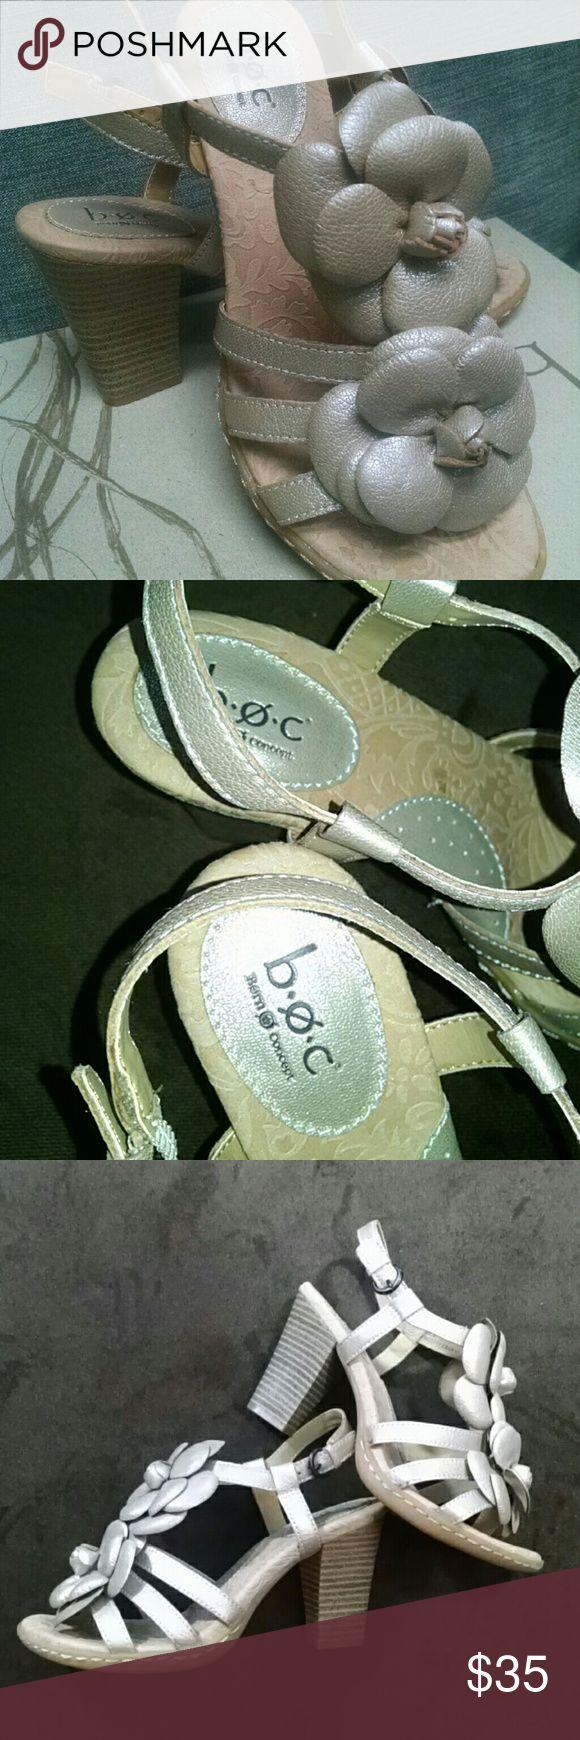 "B.O.C  Born Concept Open Toe Sandal/Floral Accent Open Toe Sandal Color:  Champagne Size: 6 M/W, 3 1/2"" Heel BEAUTIFUL SANDAL,  Worn 1X B.O.C. Born Concept Shoes Sandals"